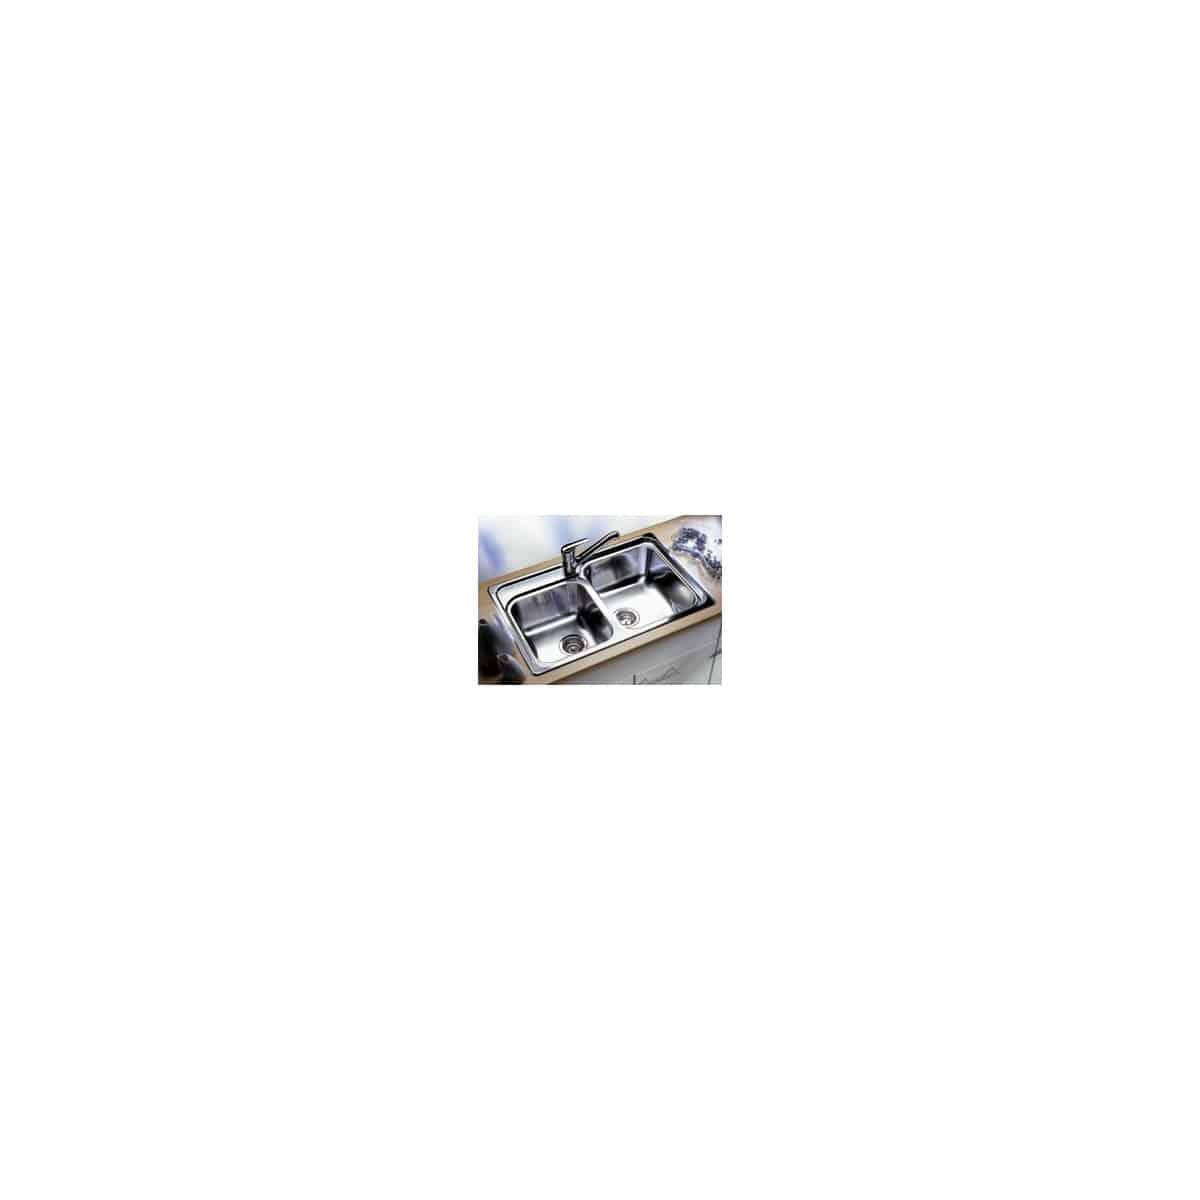 Blancoclassic 8-IF - Inox Lisse